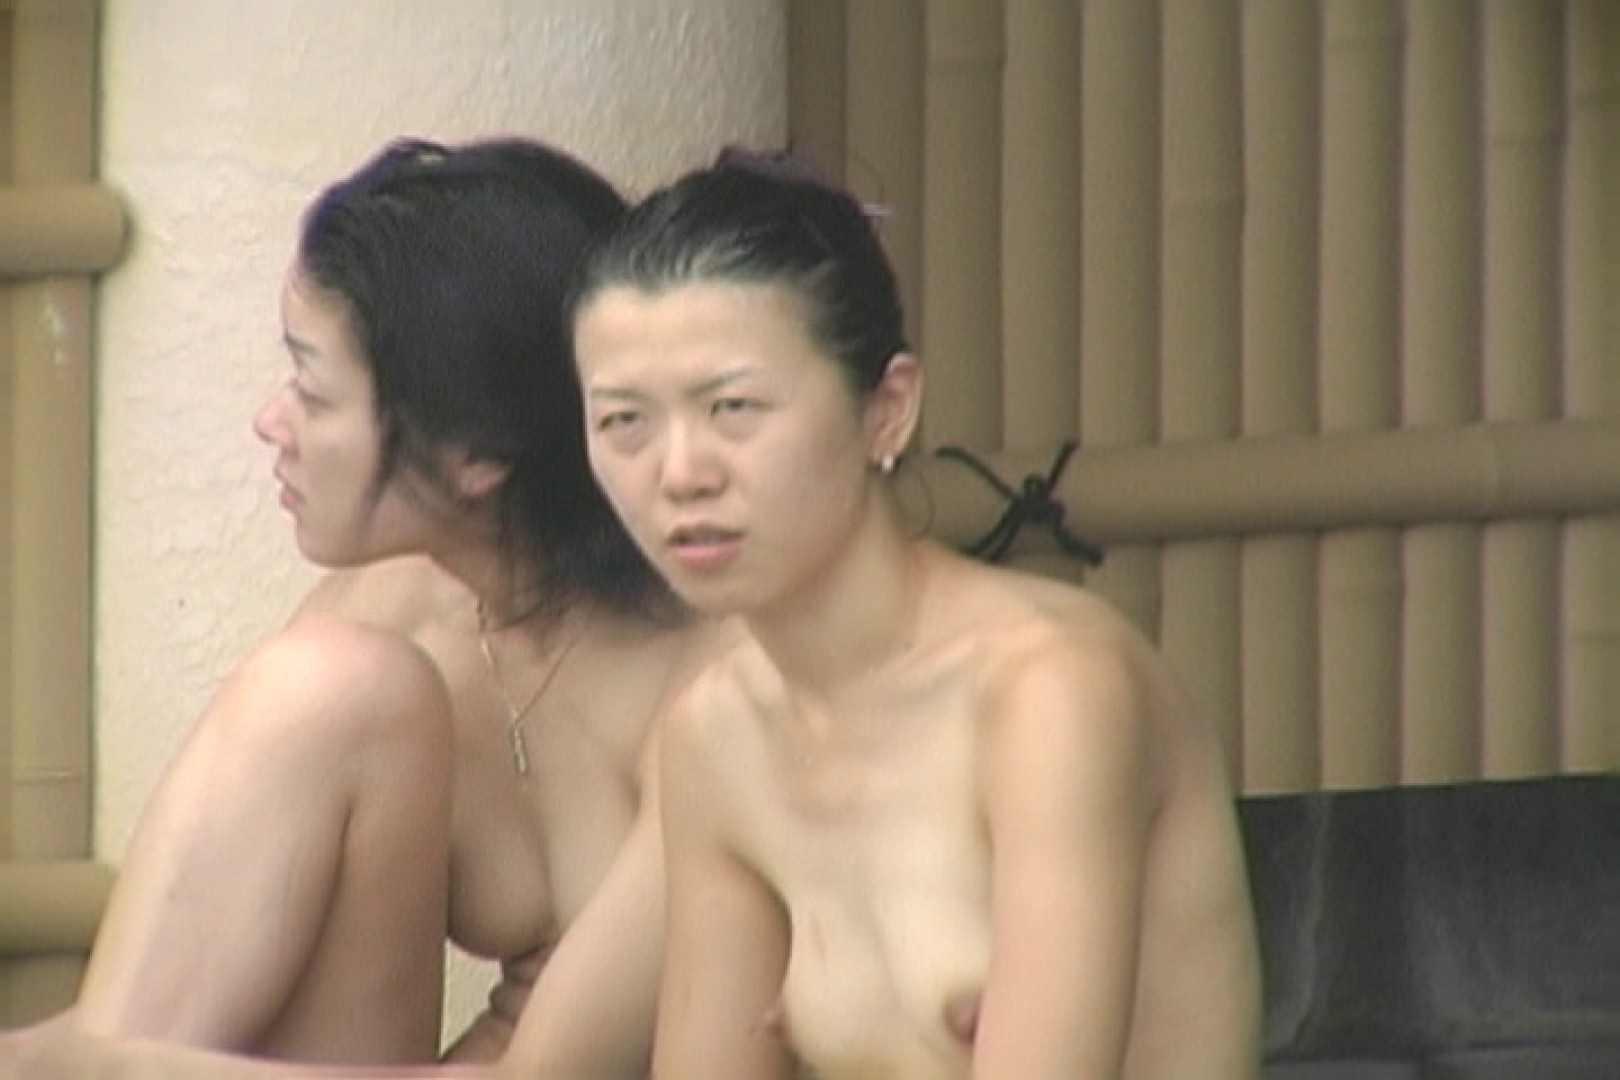 Aquaな露天風呂Vol.638 露天風呂編  87PIX 48